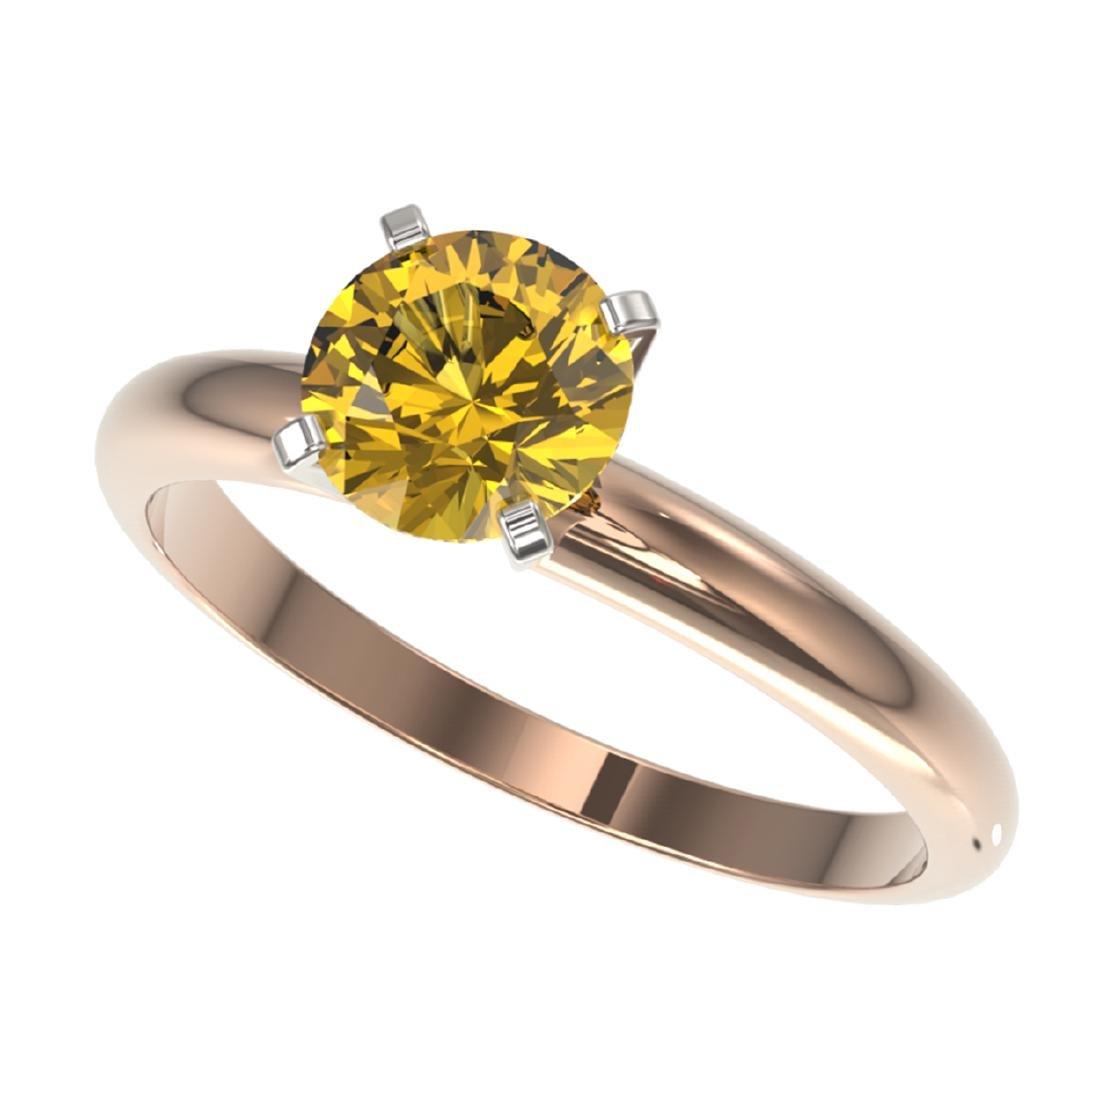 1.27 ctw Intense Yellow Diamond Solitaire Ring 10K Rose